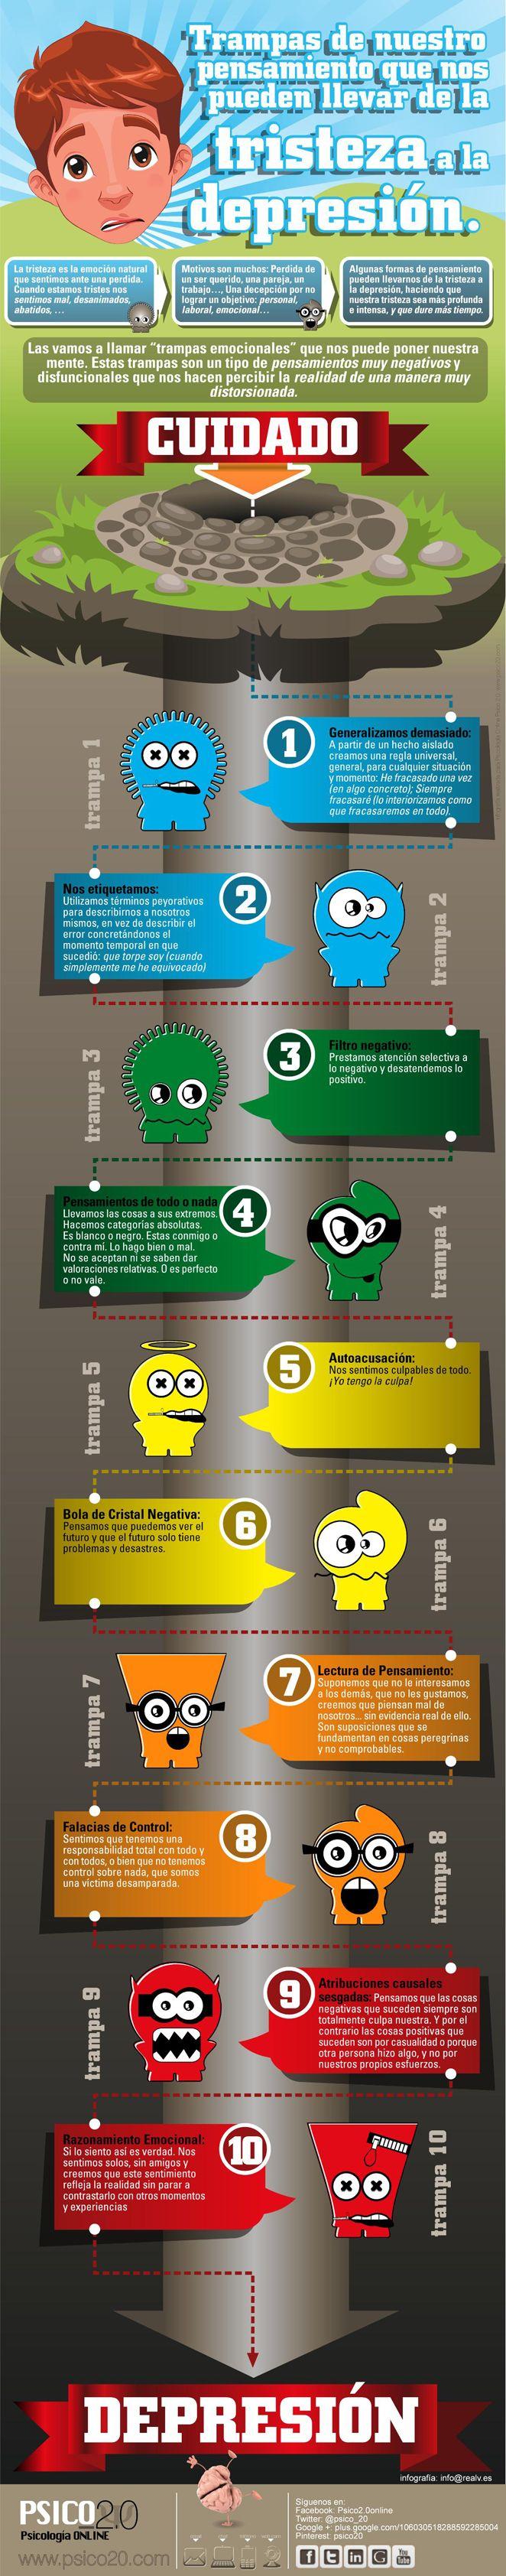 El paso de la tristeza a la depresión #infografia #infographic #health